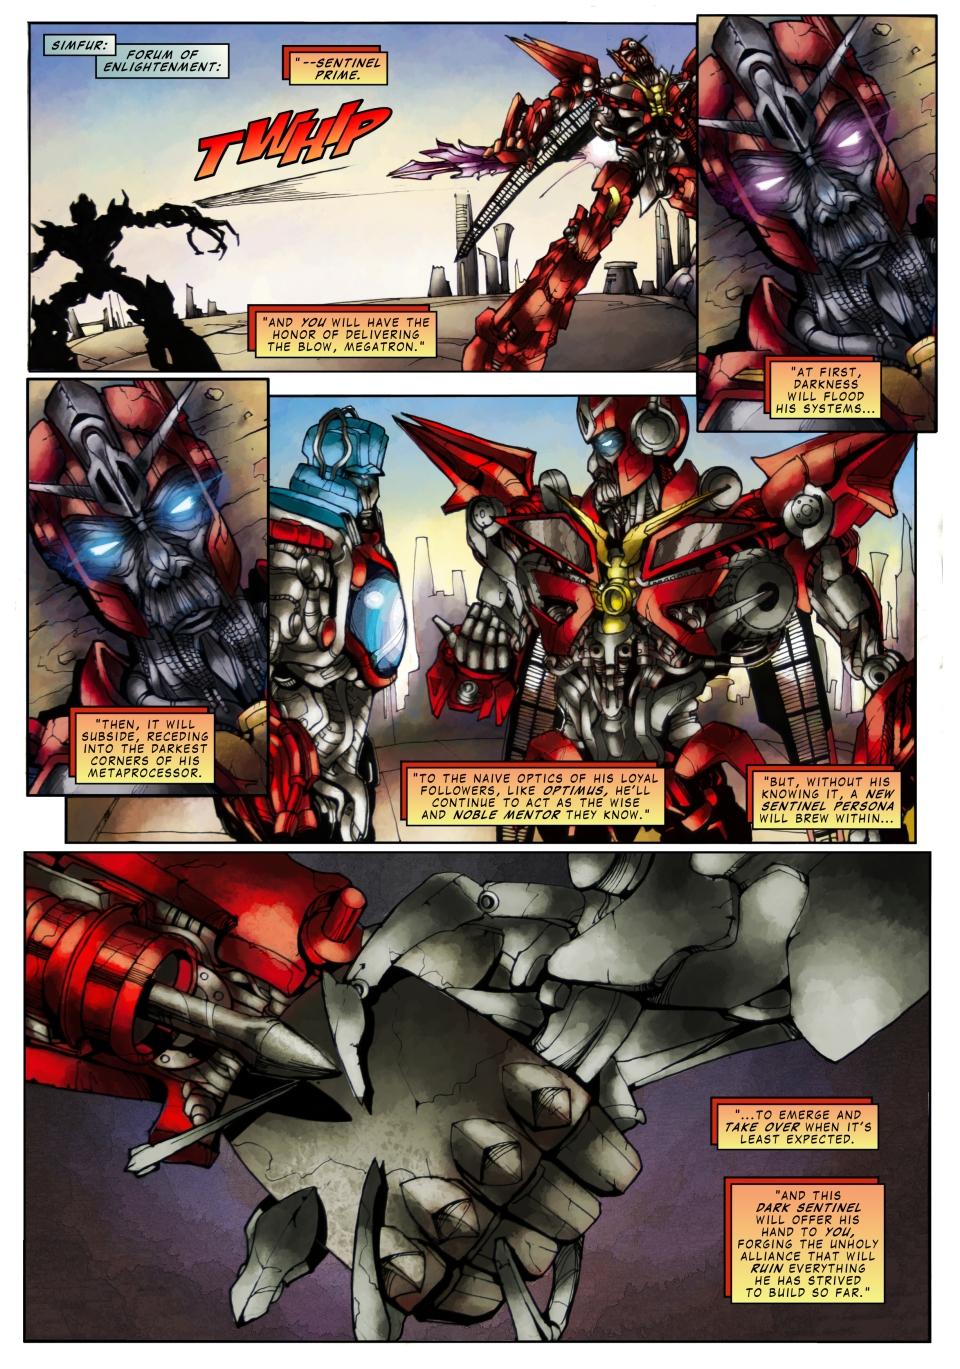 Dark Side Of Sentinel p02